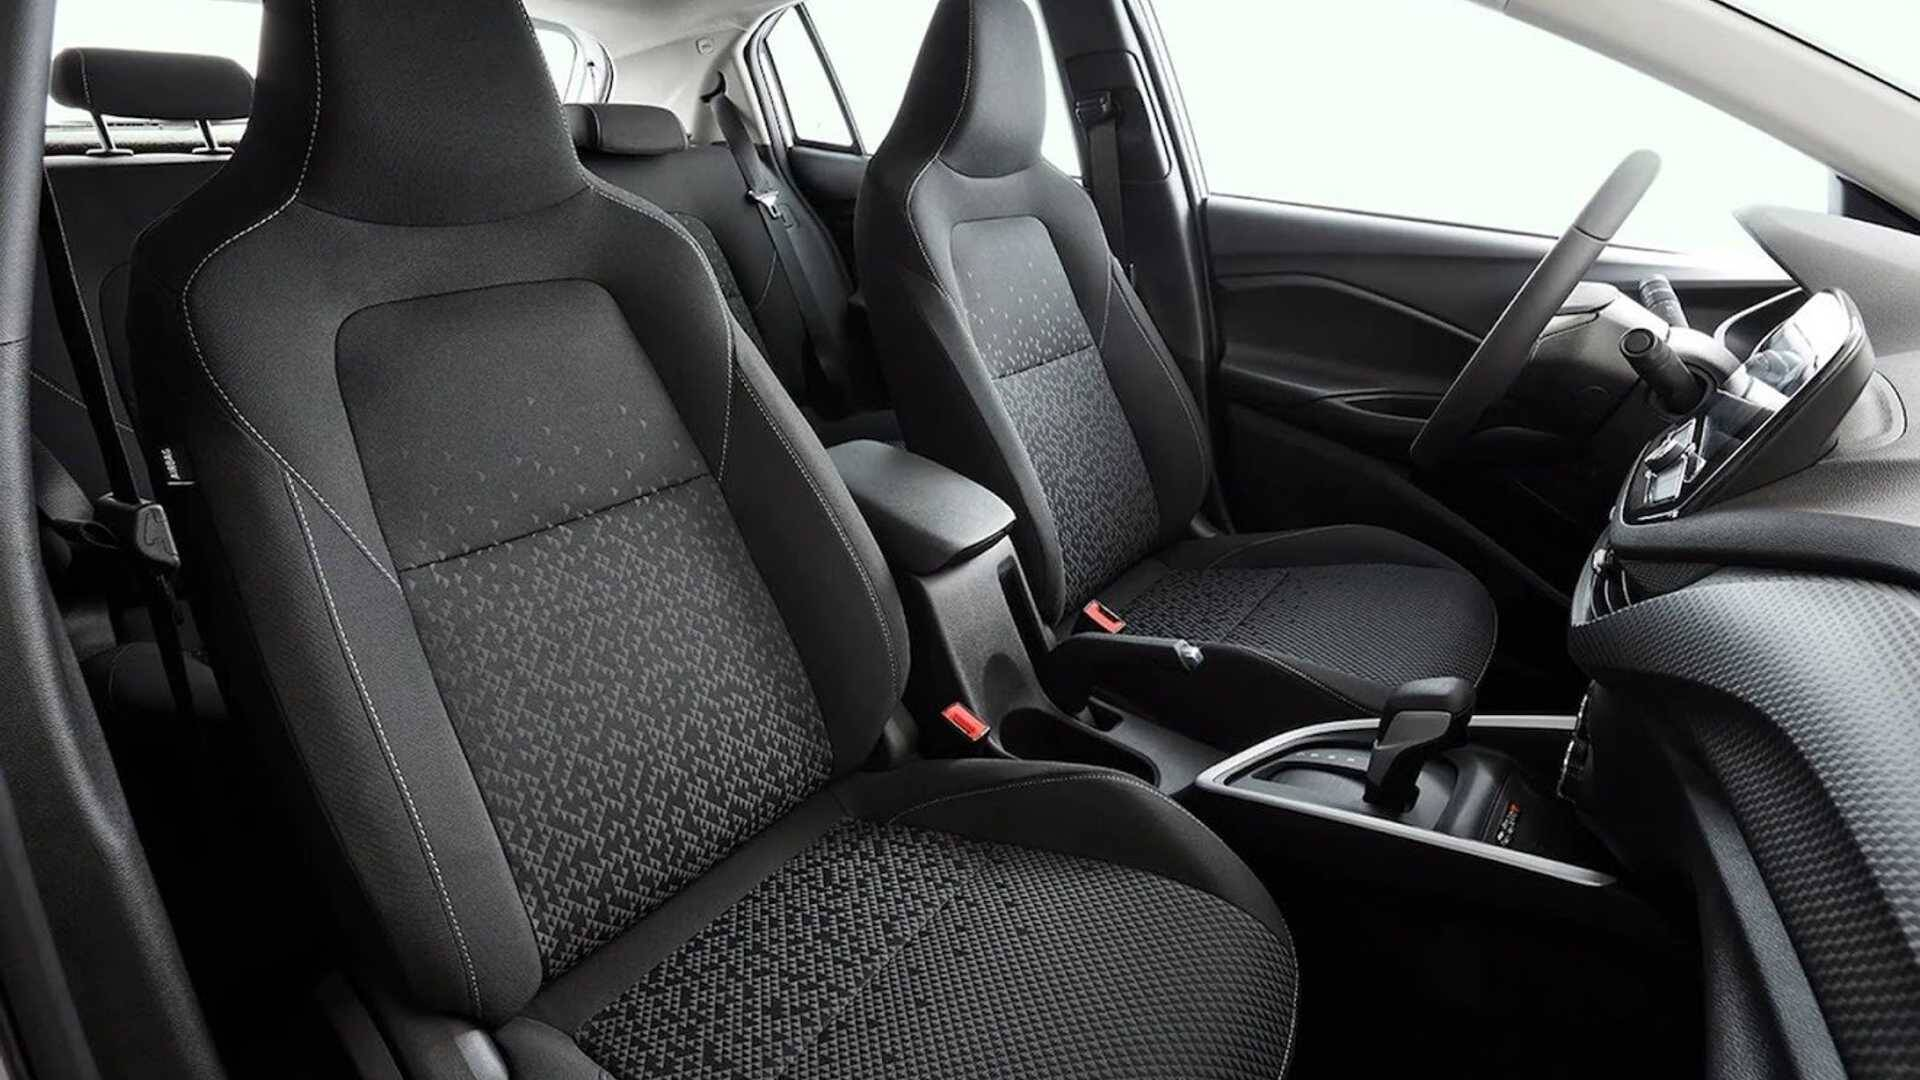 Chevrolet Onix hatch. Foto: Divulgação